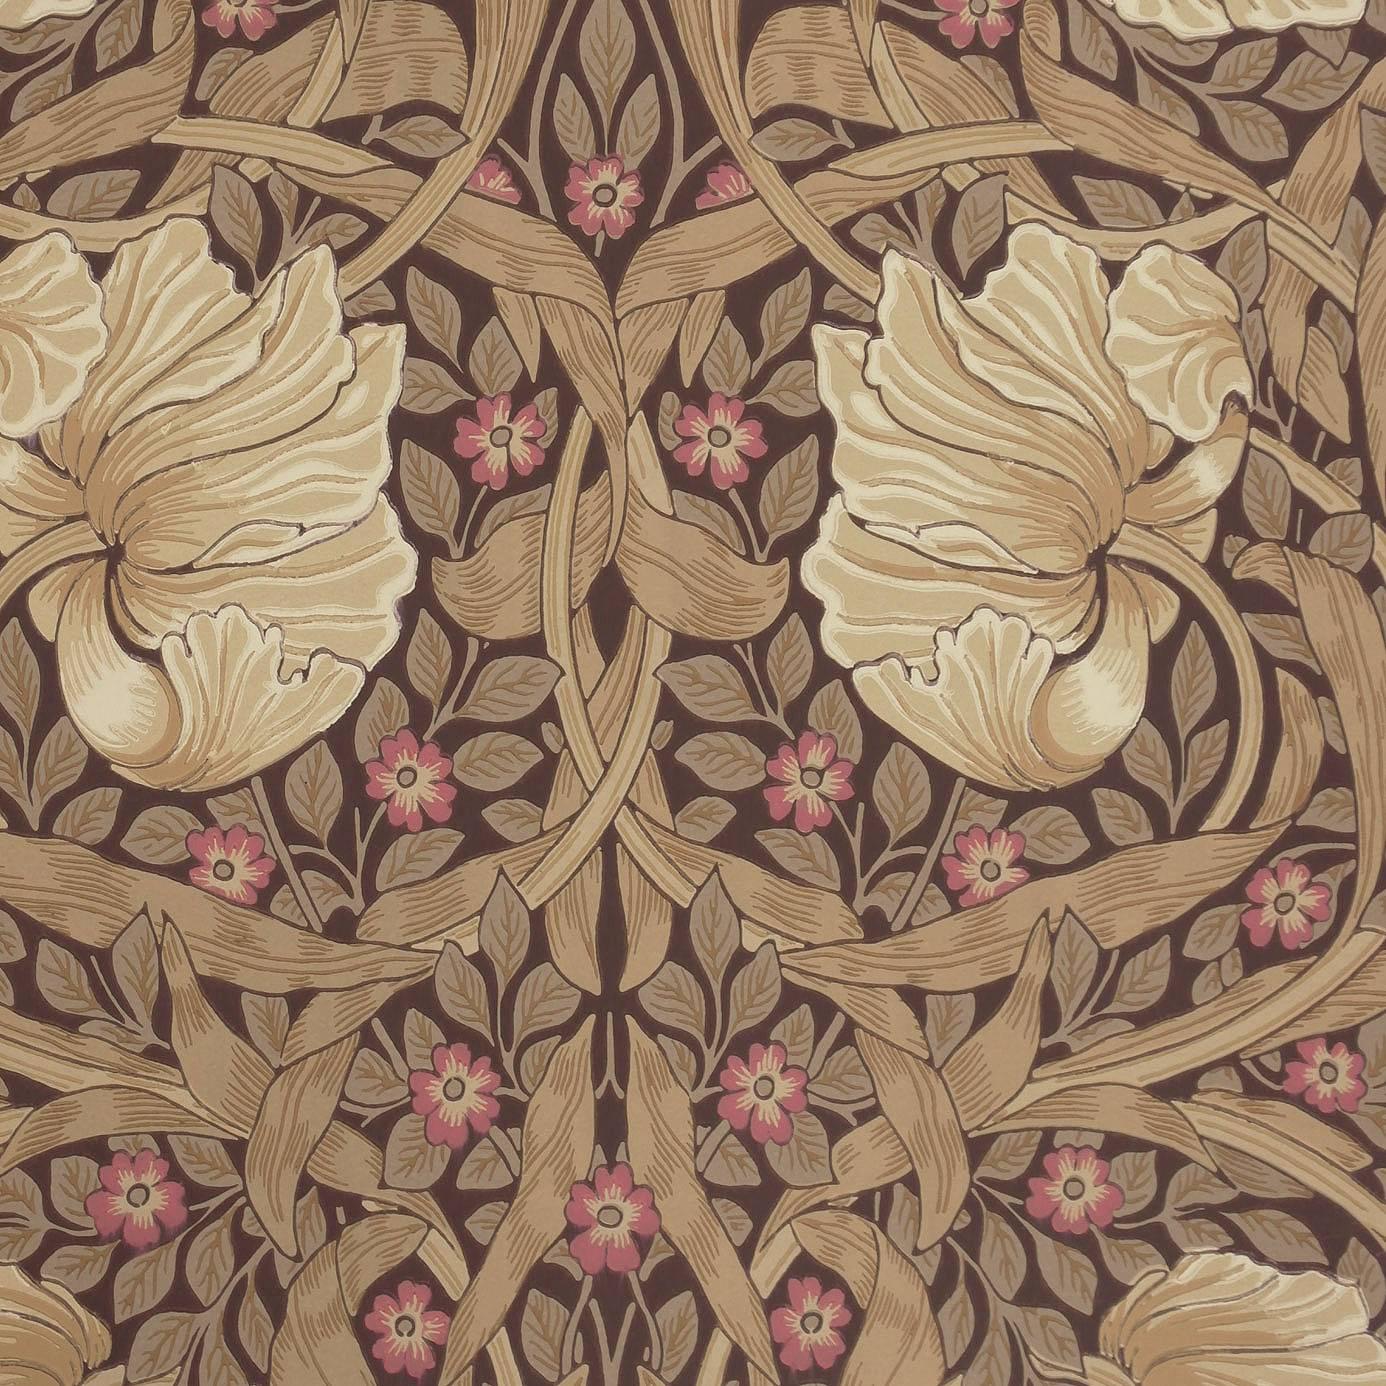 William Morris Wallpaper: Pimpernel Wallpaper